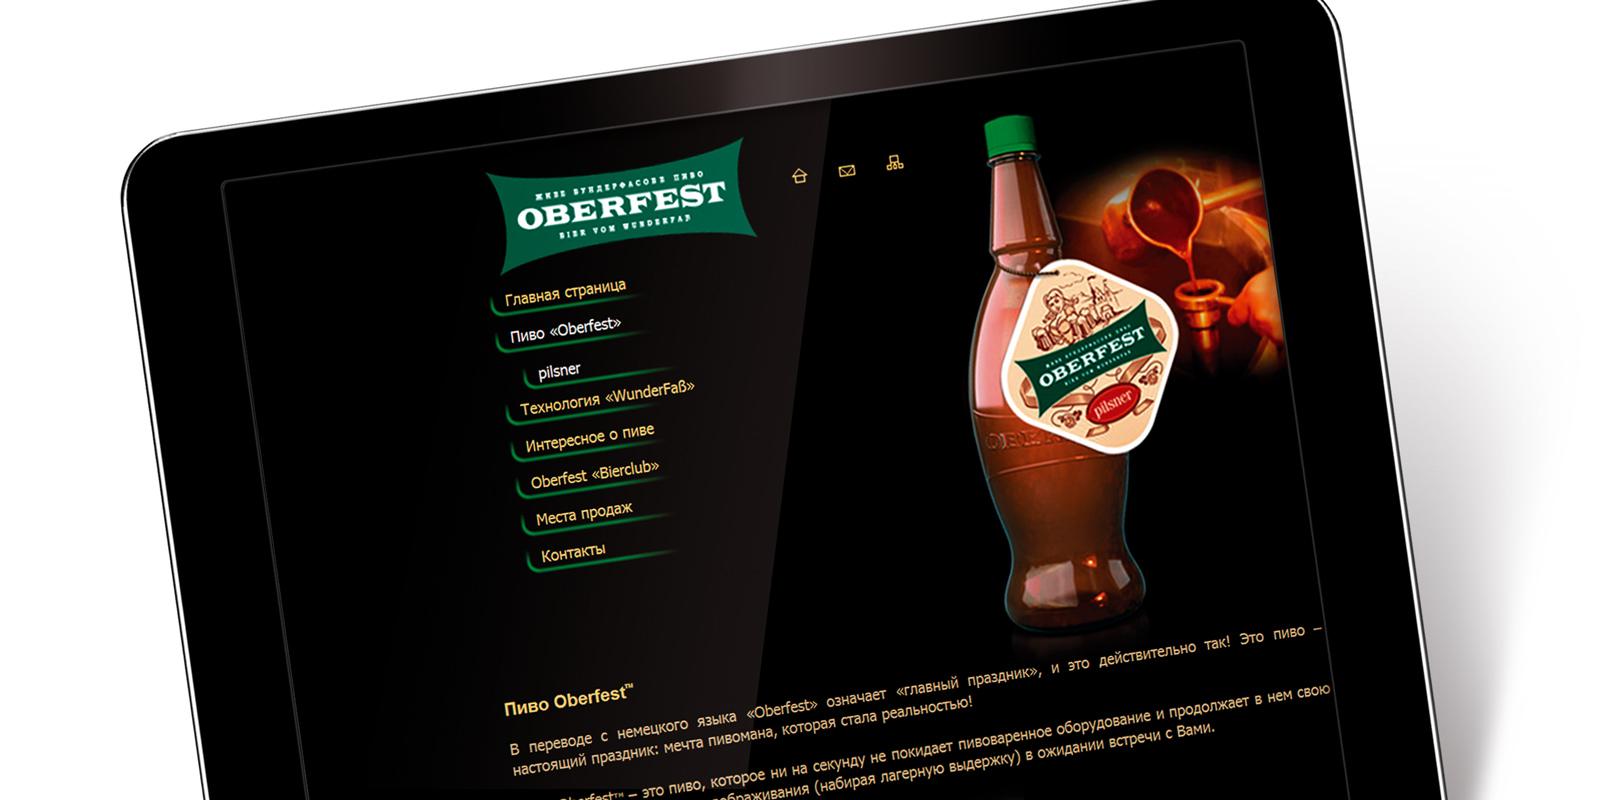 TM Oberfest;;;;;;Разработка и дизайн сайта;;;;;;<span>Клиент:</span> TM Oberfest;;;;;;;;;;;;Разработка и дизайн сайта;;;;;;3